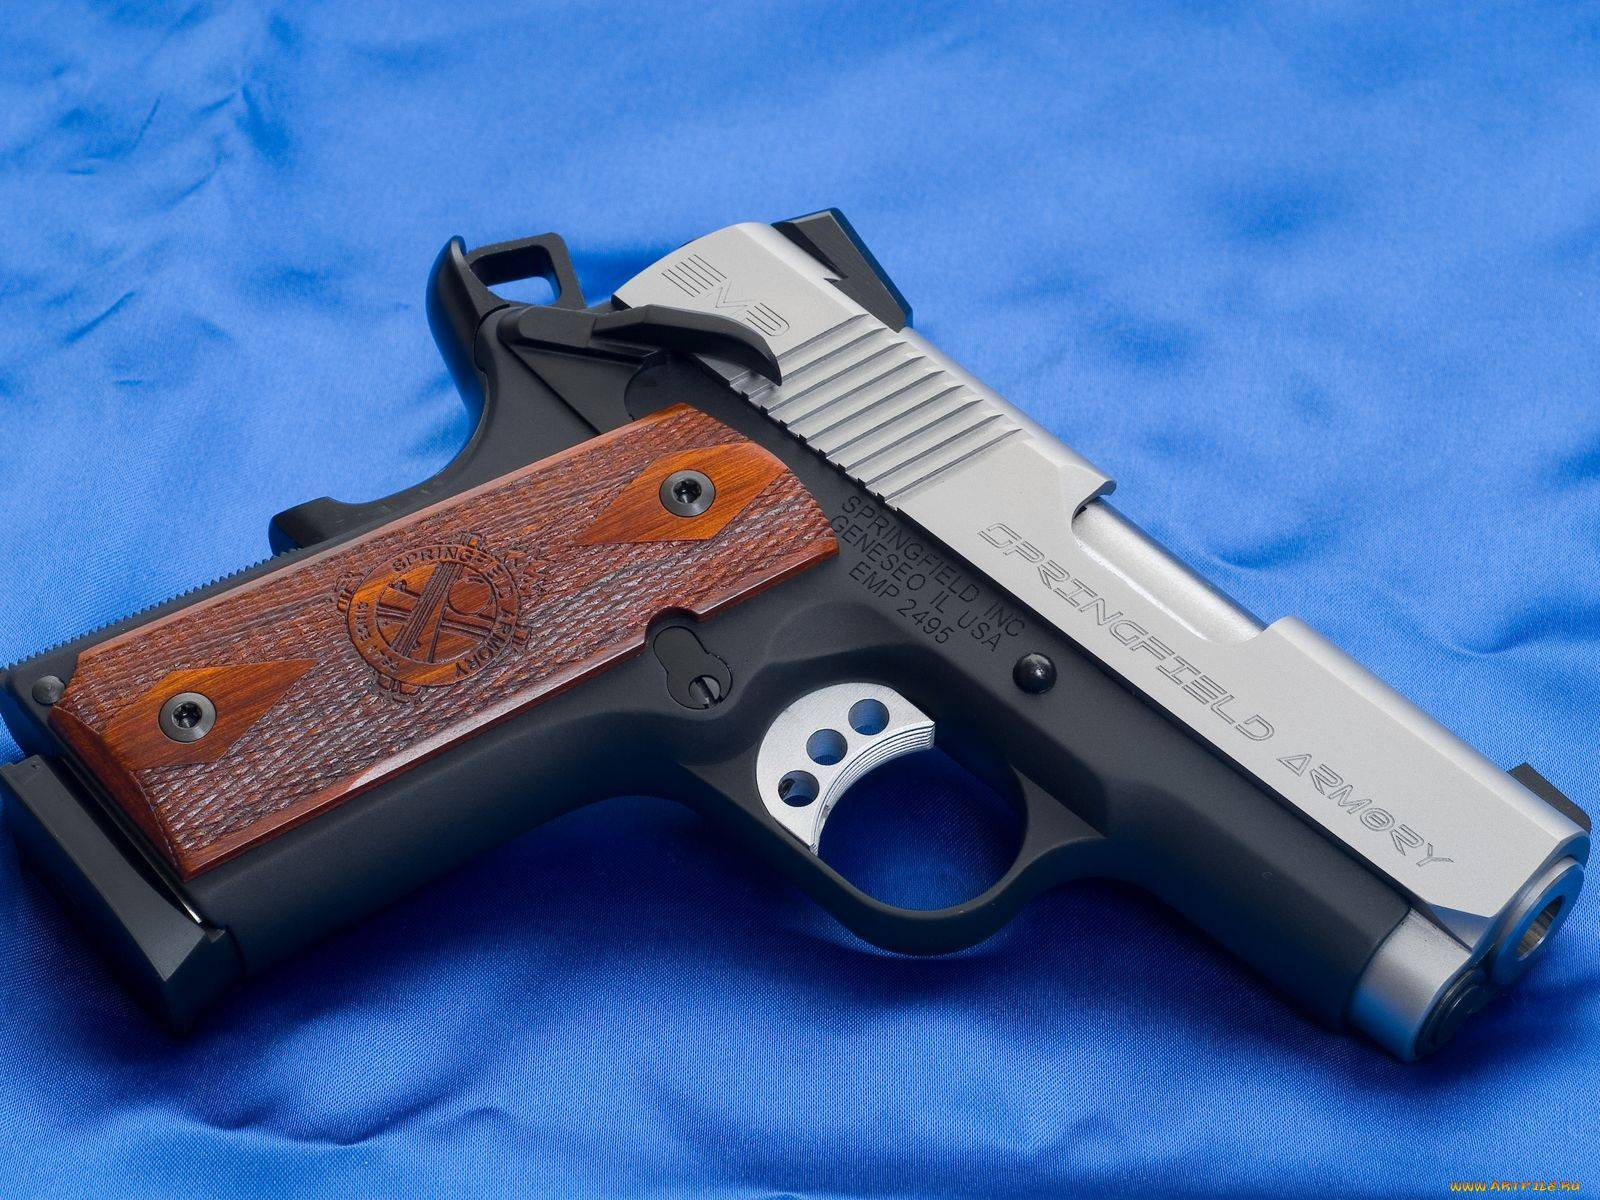 Springfield armory adds new enhanced micro pistol (emp)